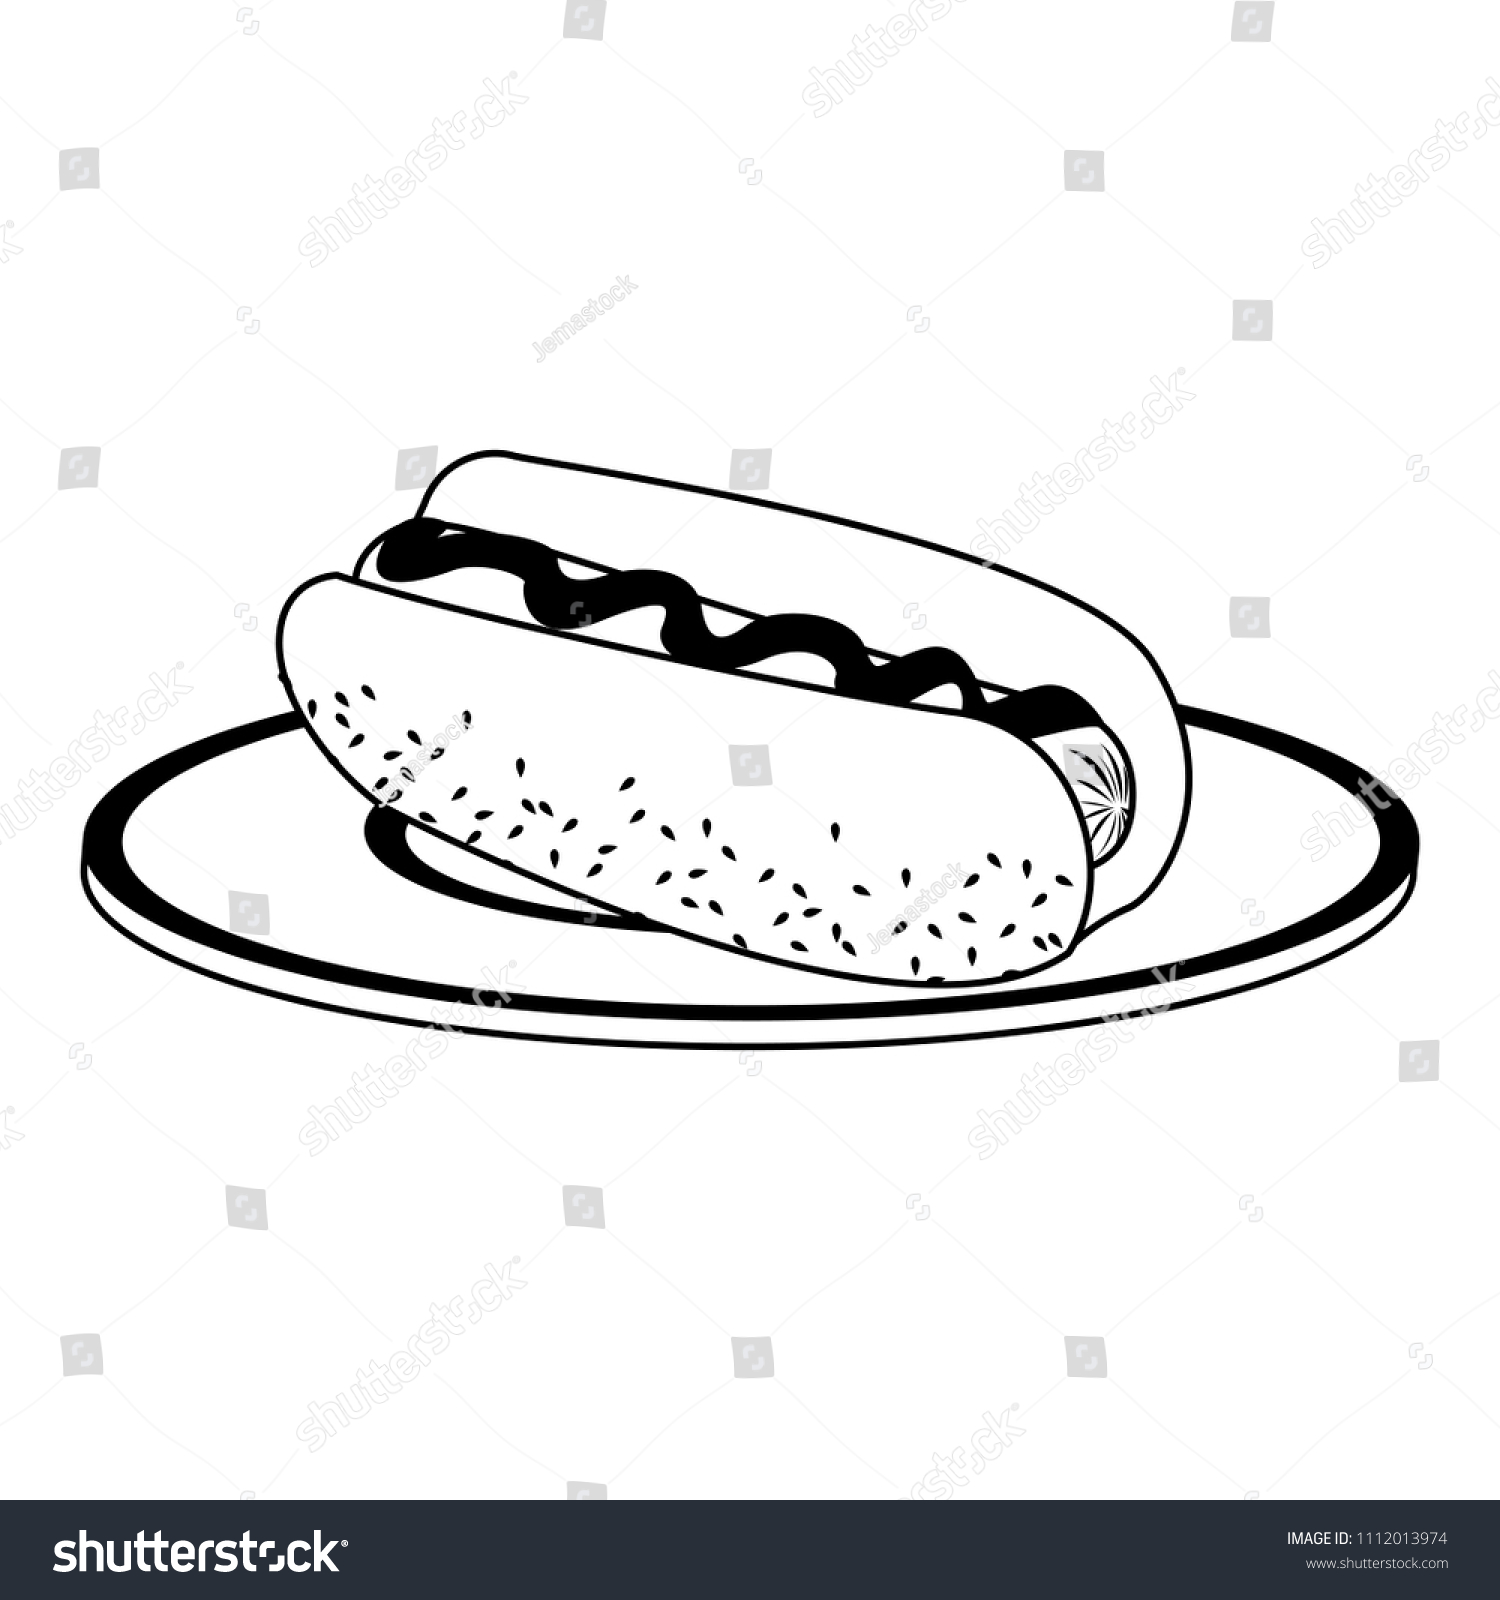 Hot Dog On Dish Black White Stock Vector Royalty Free 1112013974